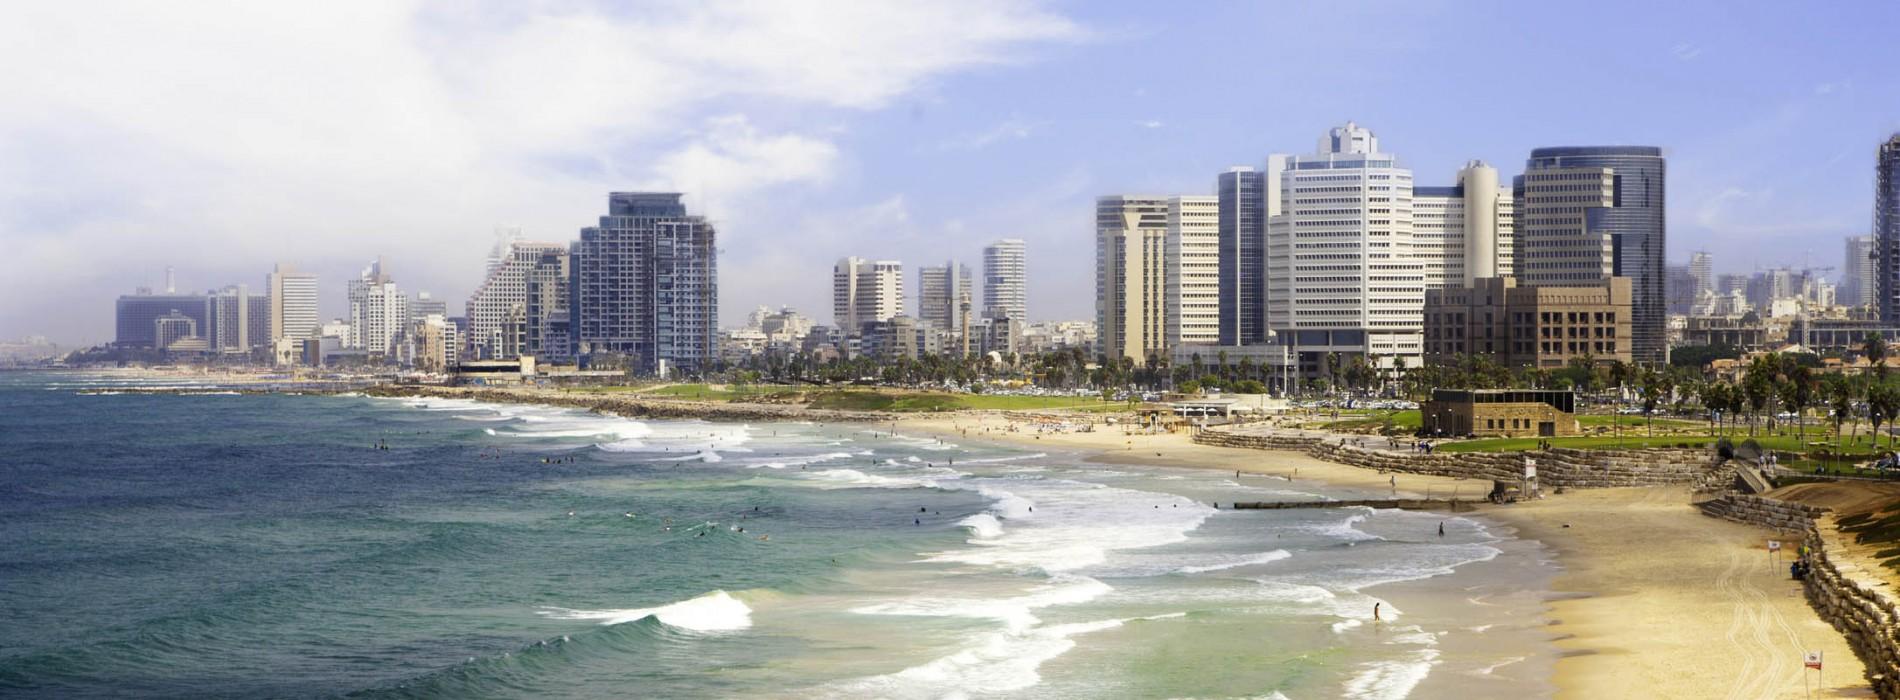 Air India to increase frequency of Delhi-Tel Aviv flight